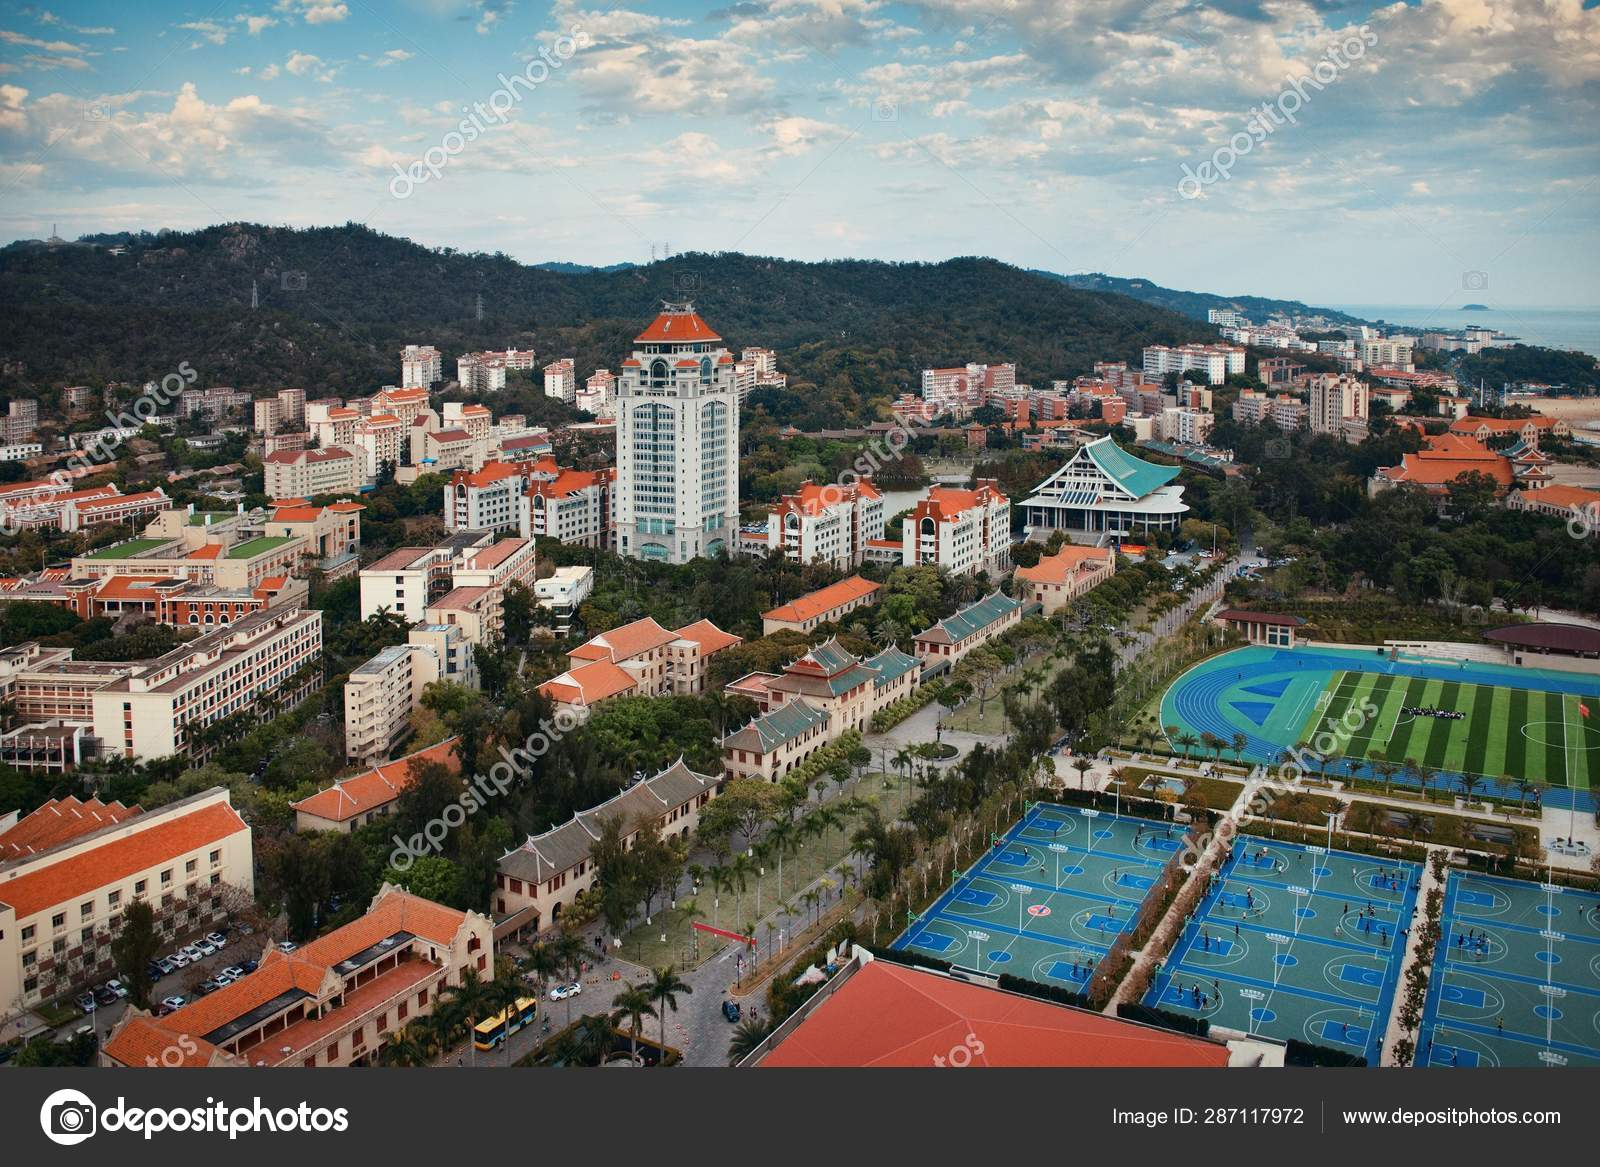 Xiamen Vista Aerea Da Universidade Fotos Imagens De C Rabbit75 Dep 287117972